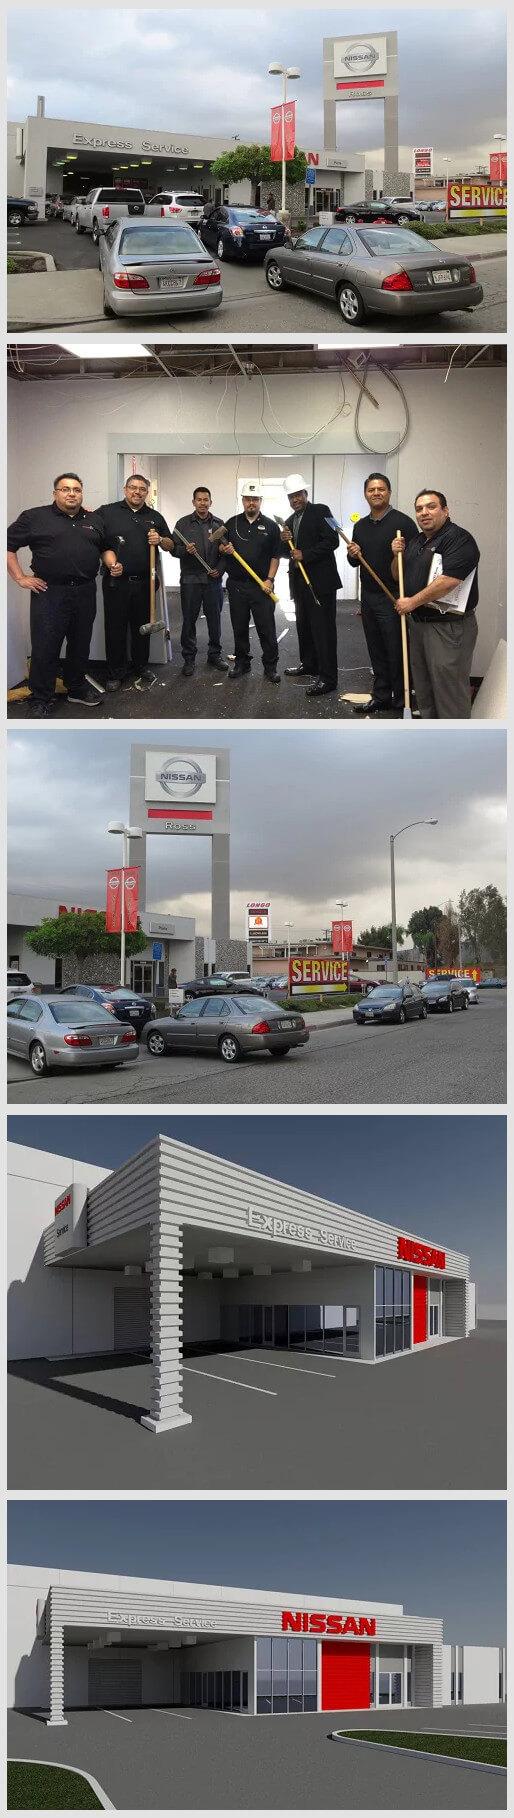 Attractive Ross Nissan El Monte U2013 Service And Parts Expansion